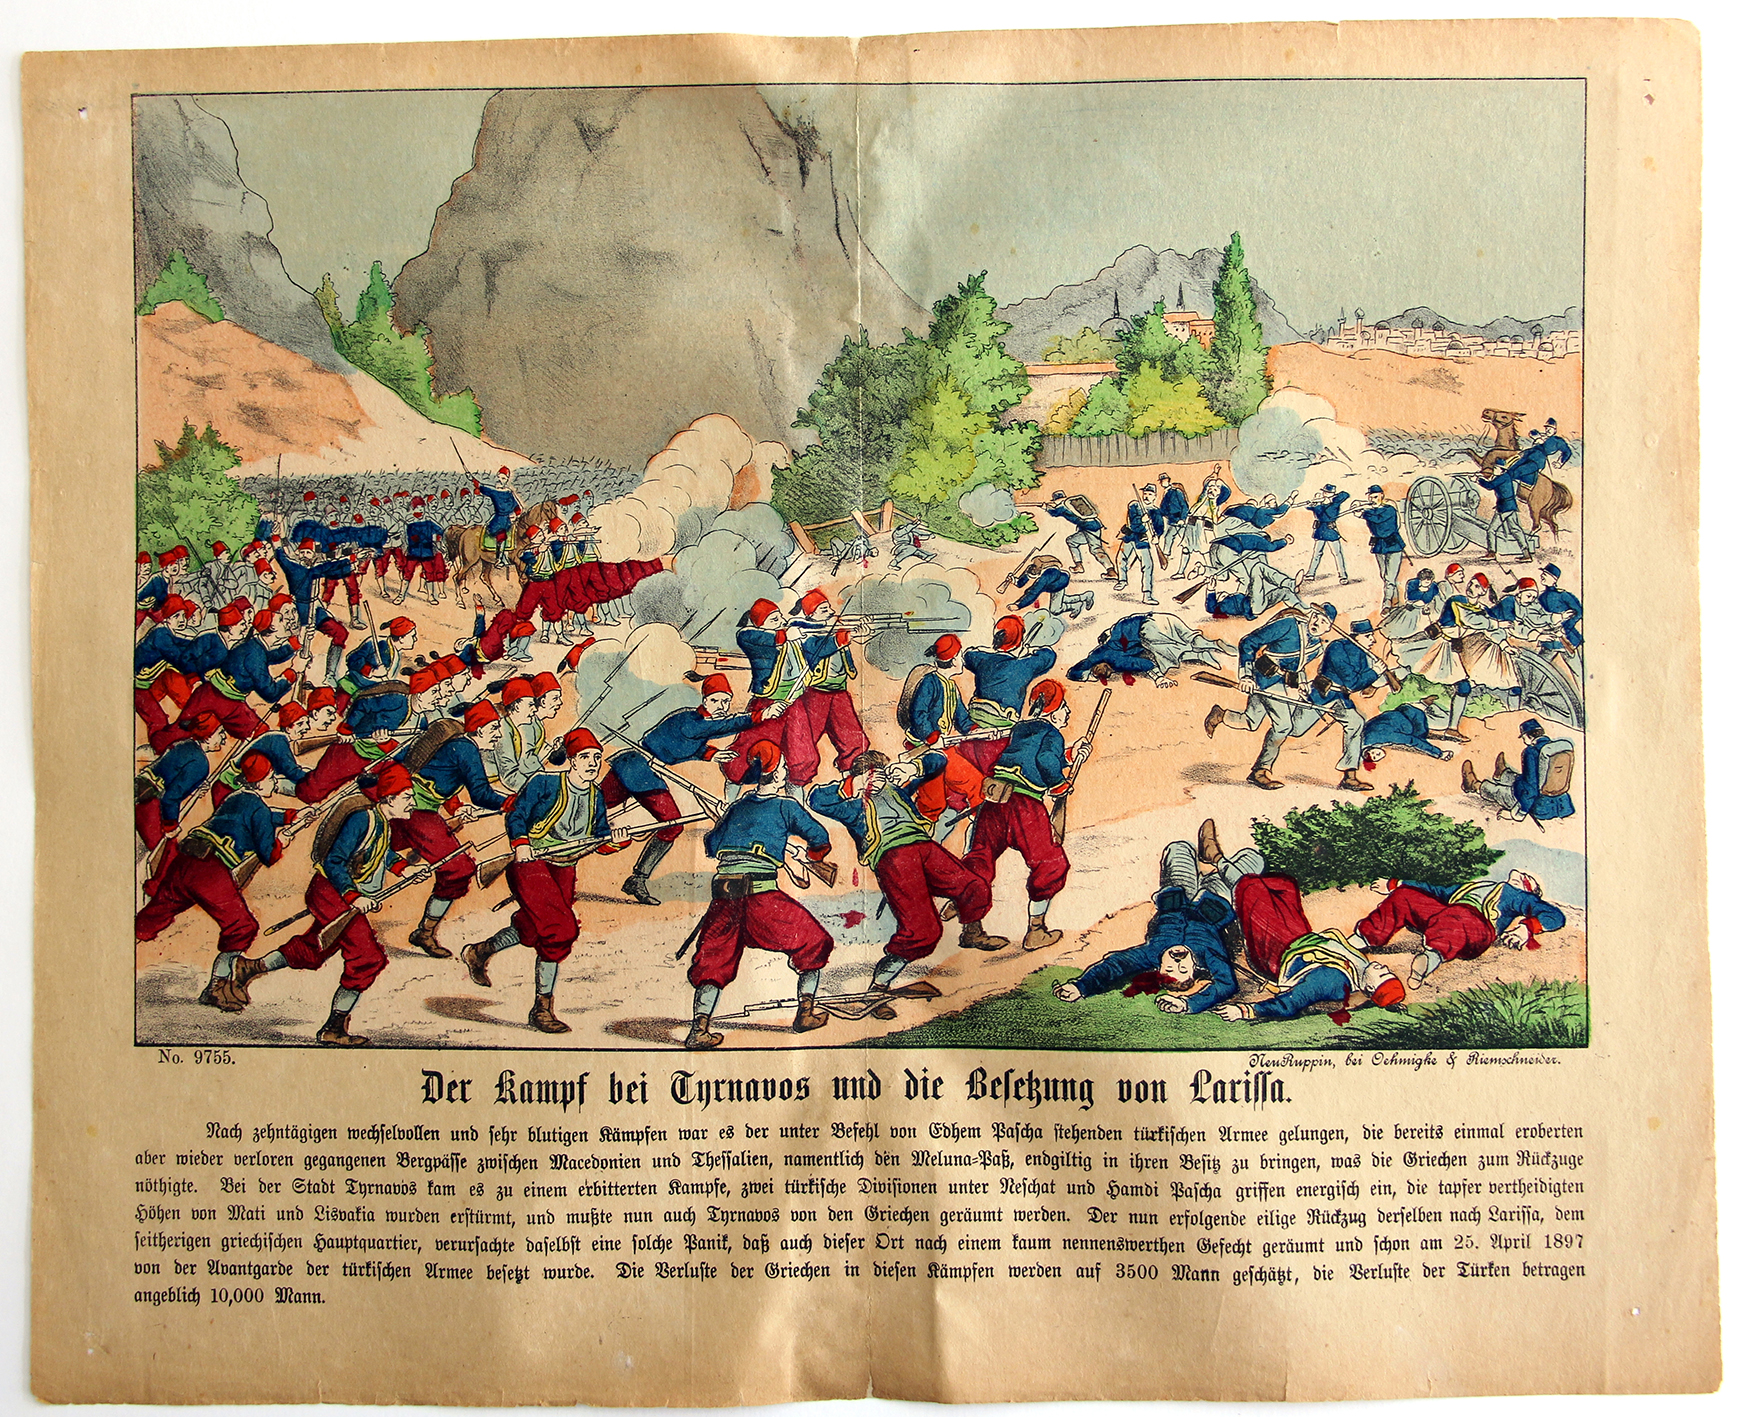 2 Planches imagerie - Neu-Ruppin, Bei Oehmigke & Riemschneider - Fin XIX - Guerre Greco-Turque